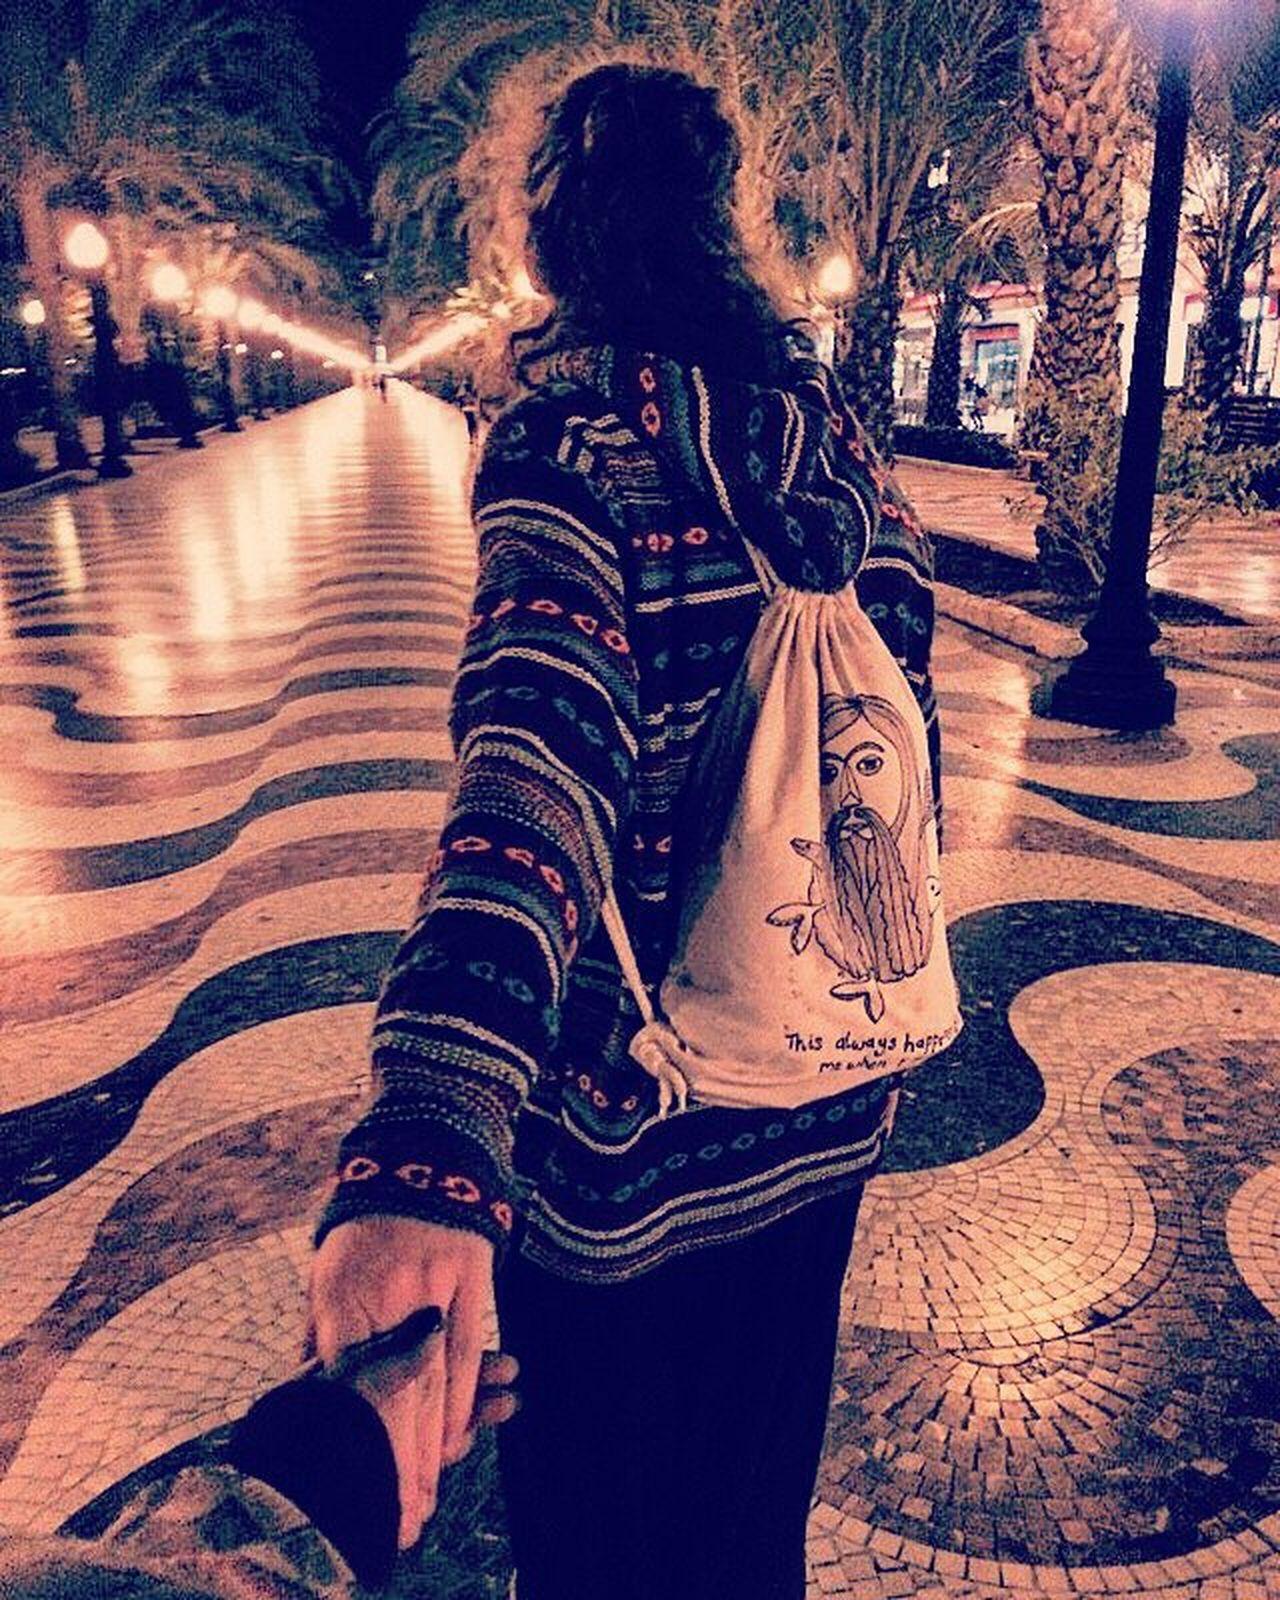 I love it when you hold my hand💜 Spanien SPAIN Holiday Urlaub With Girlfriend Alicante Seaside Meer Beatiful Evening Nevergiveup Bester Urlaub Mit Dir Perfekt Abend Throwback Beatiful Iloveyou